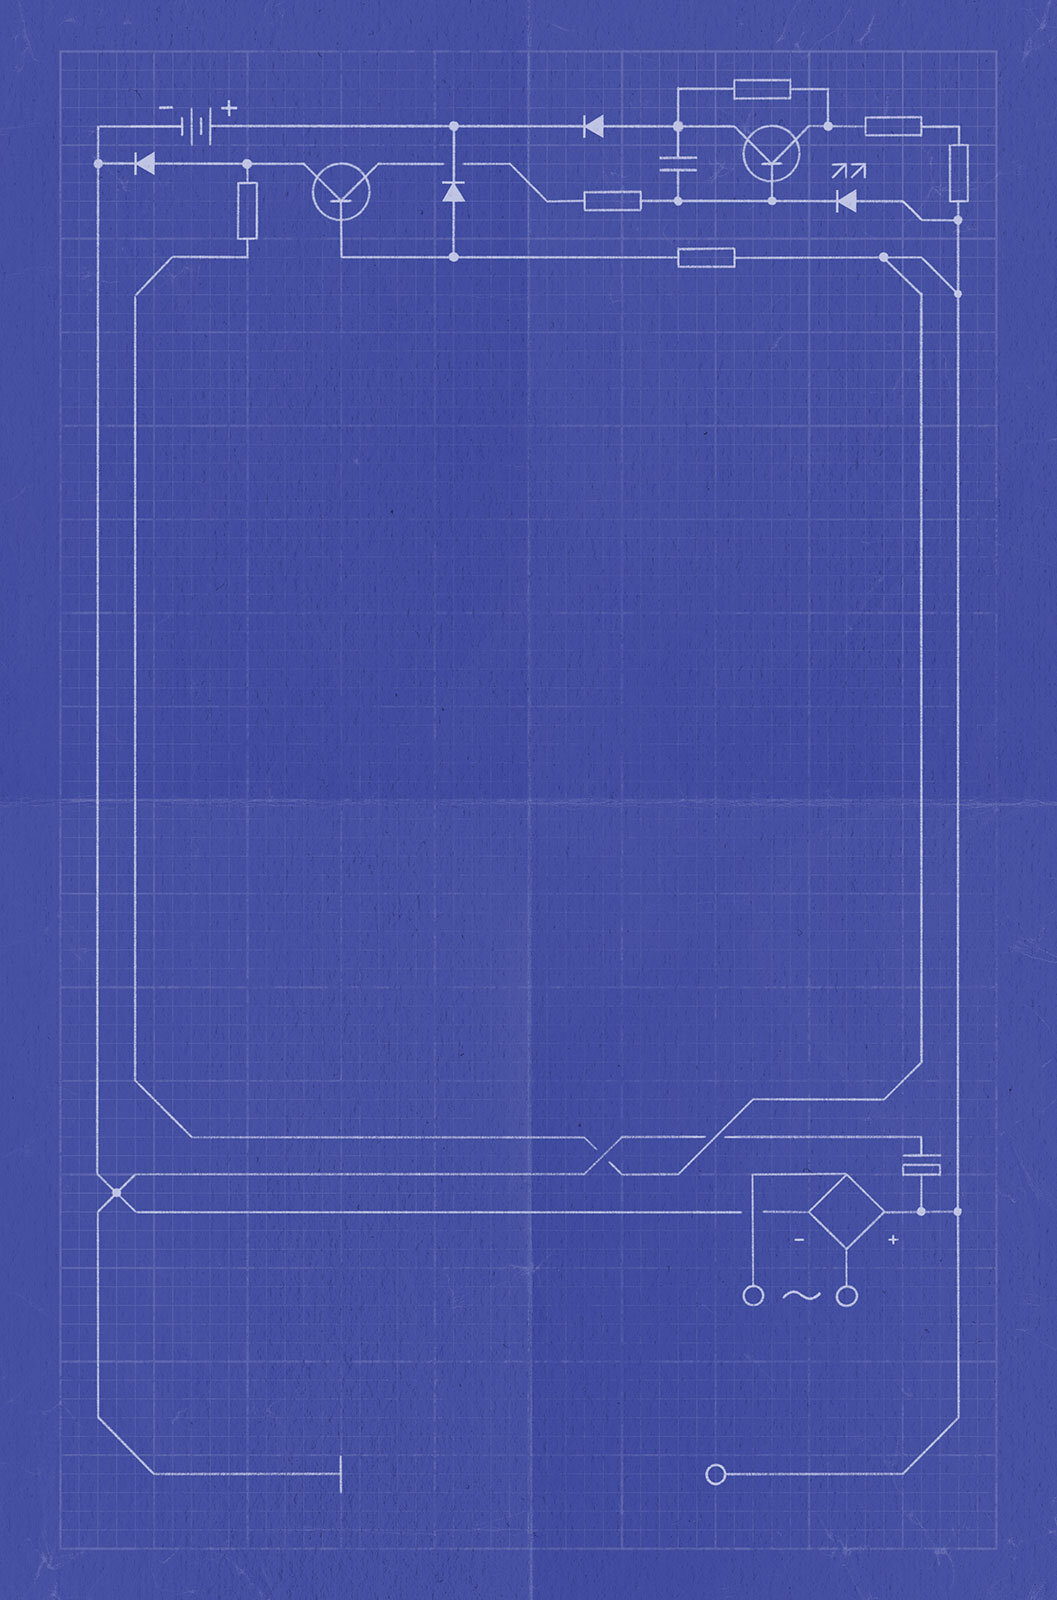 Back cover circuit design